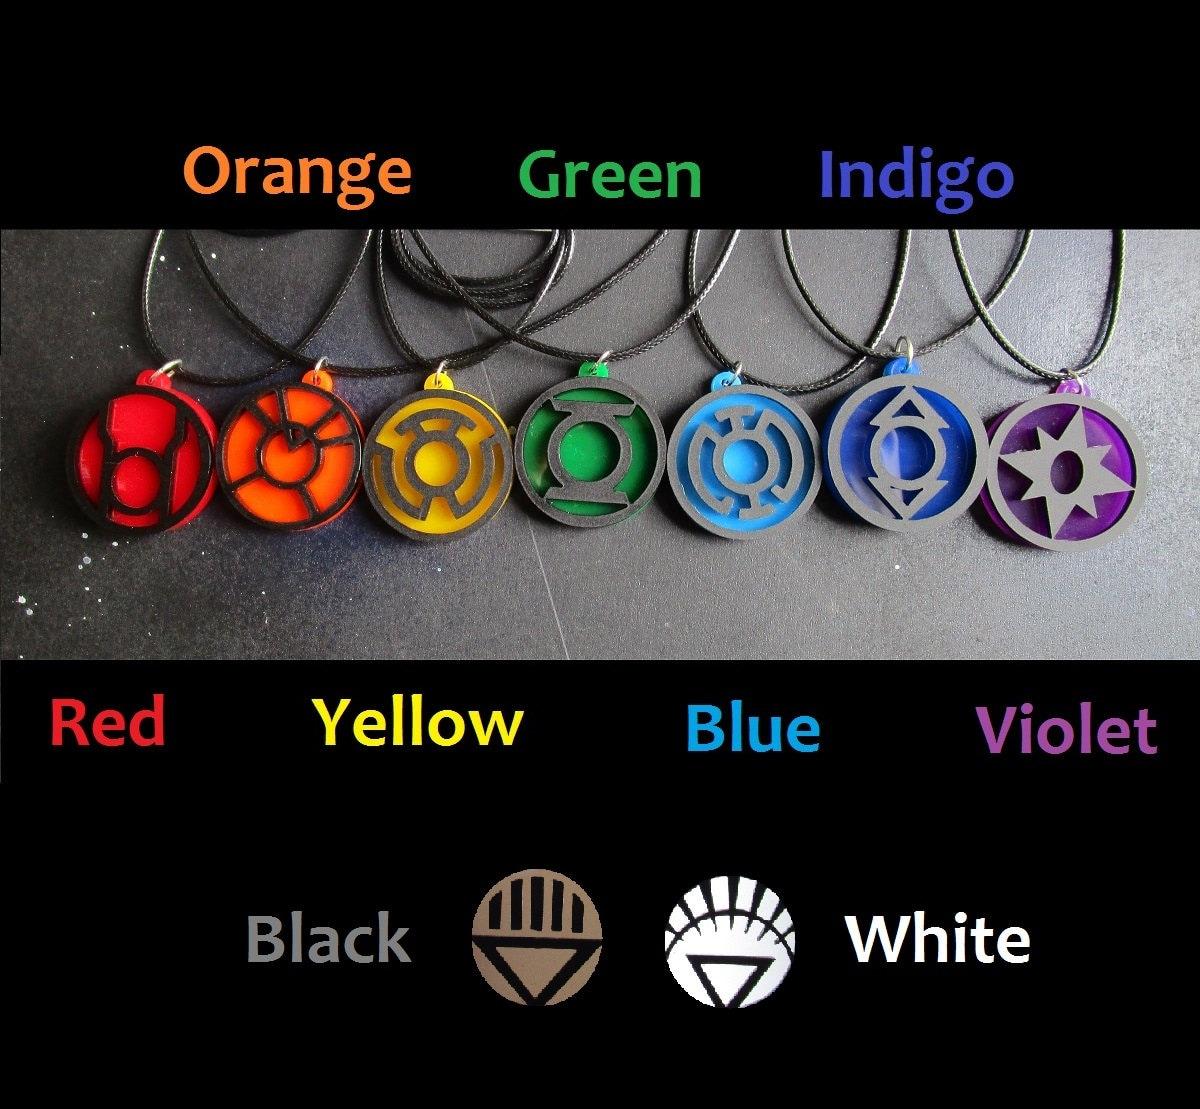 Indigo lantern corps symbol - photo#23